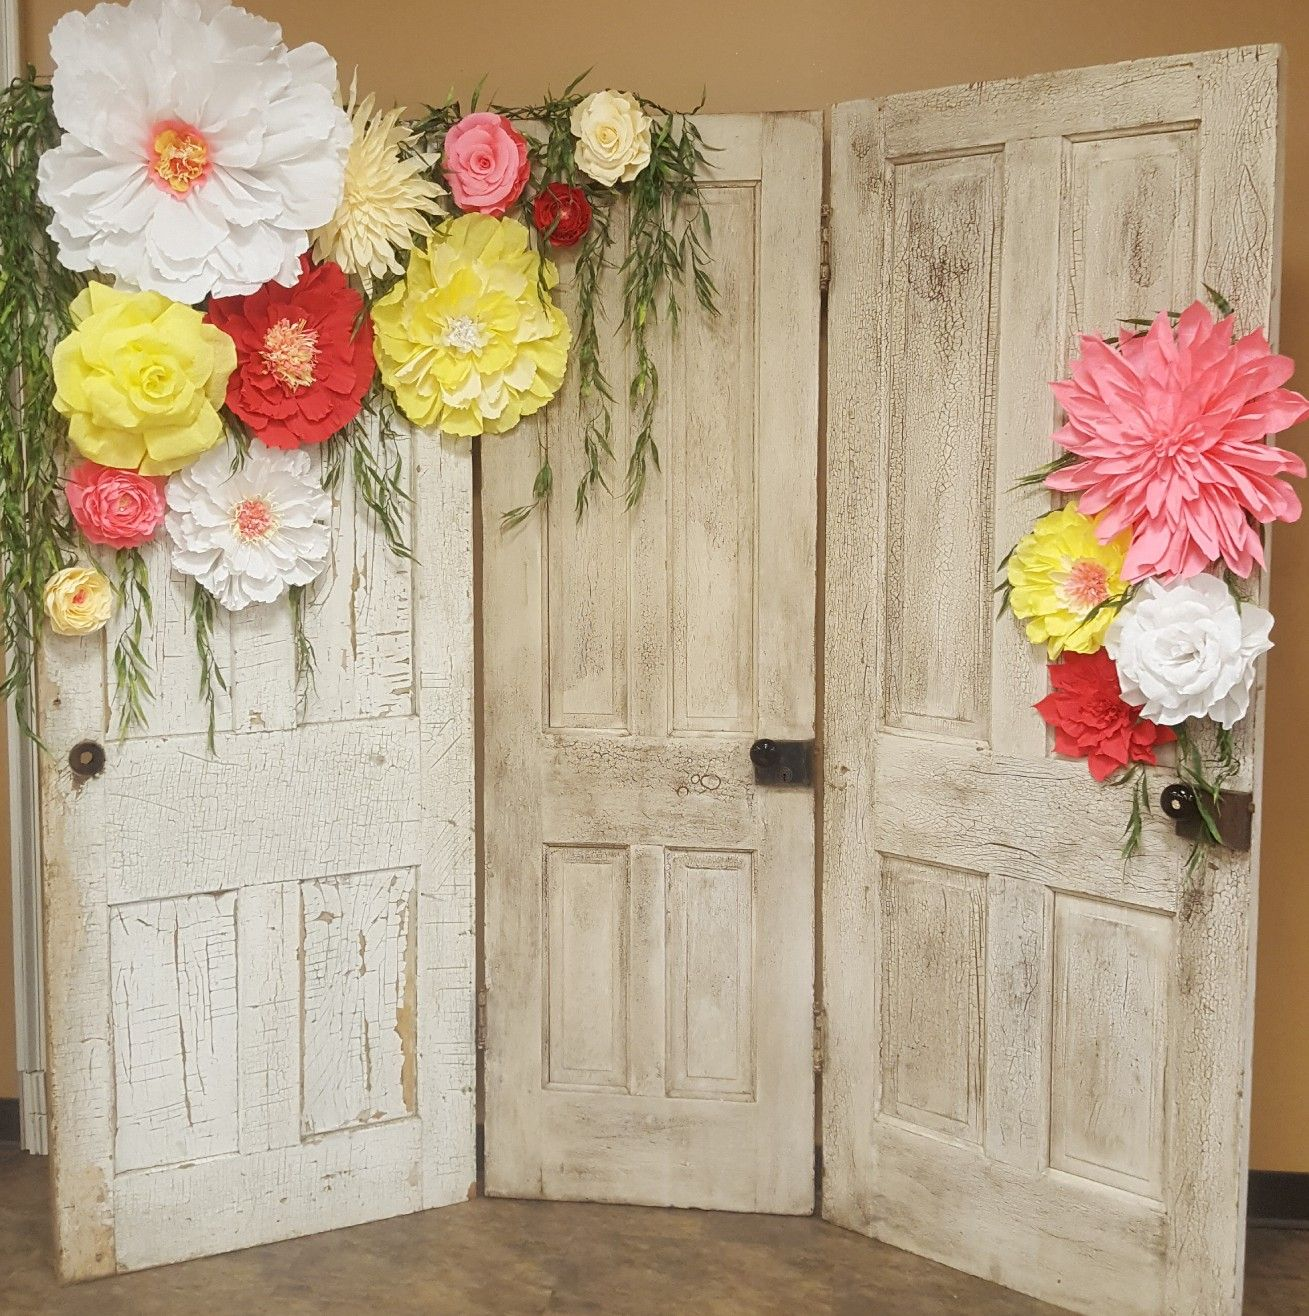 Modern Wedding Backdrop Ideas: Crepe Paper Flowers. Old Doors Backdrop Wedding